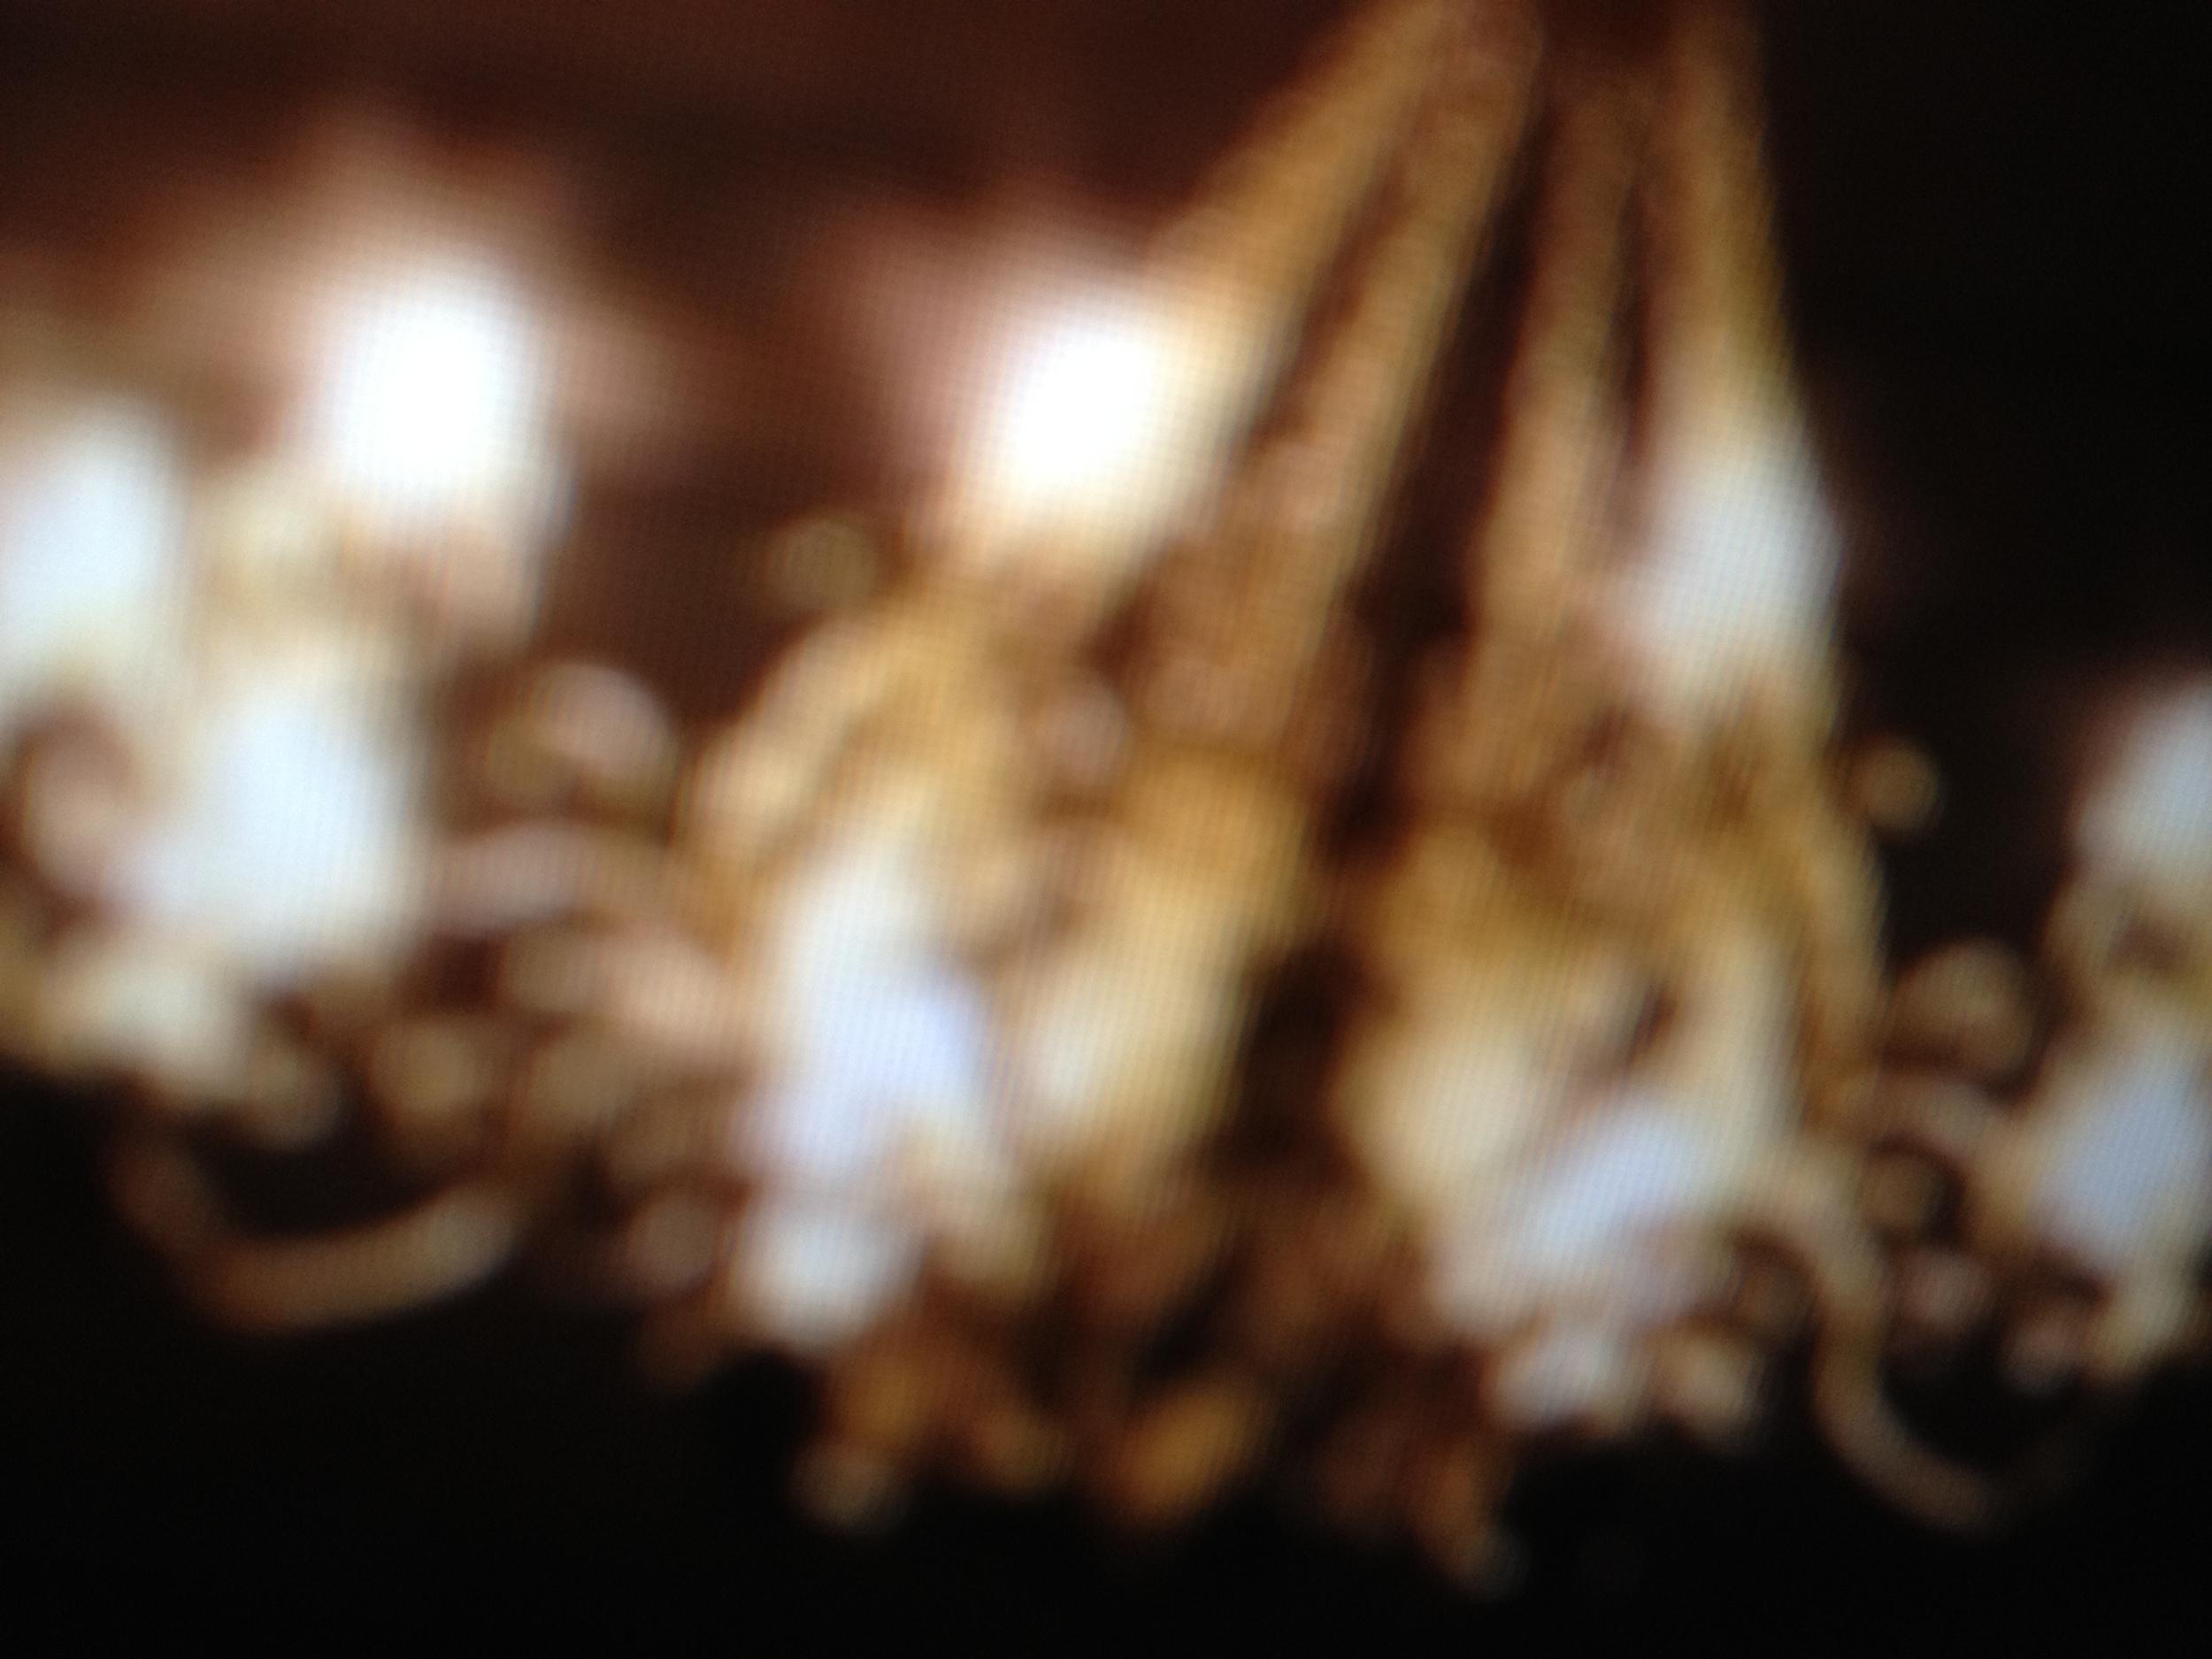 4-andtherewas-lancejones.jpg